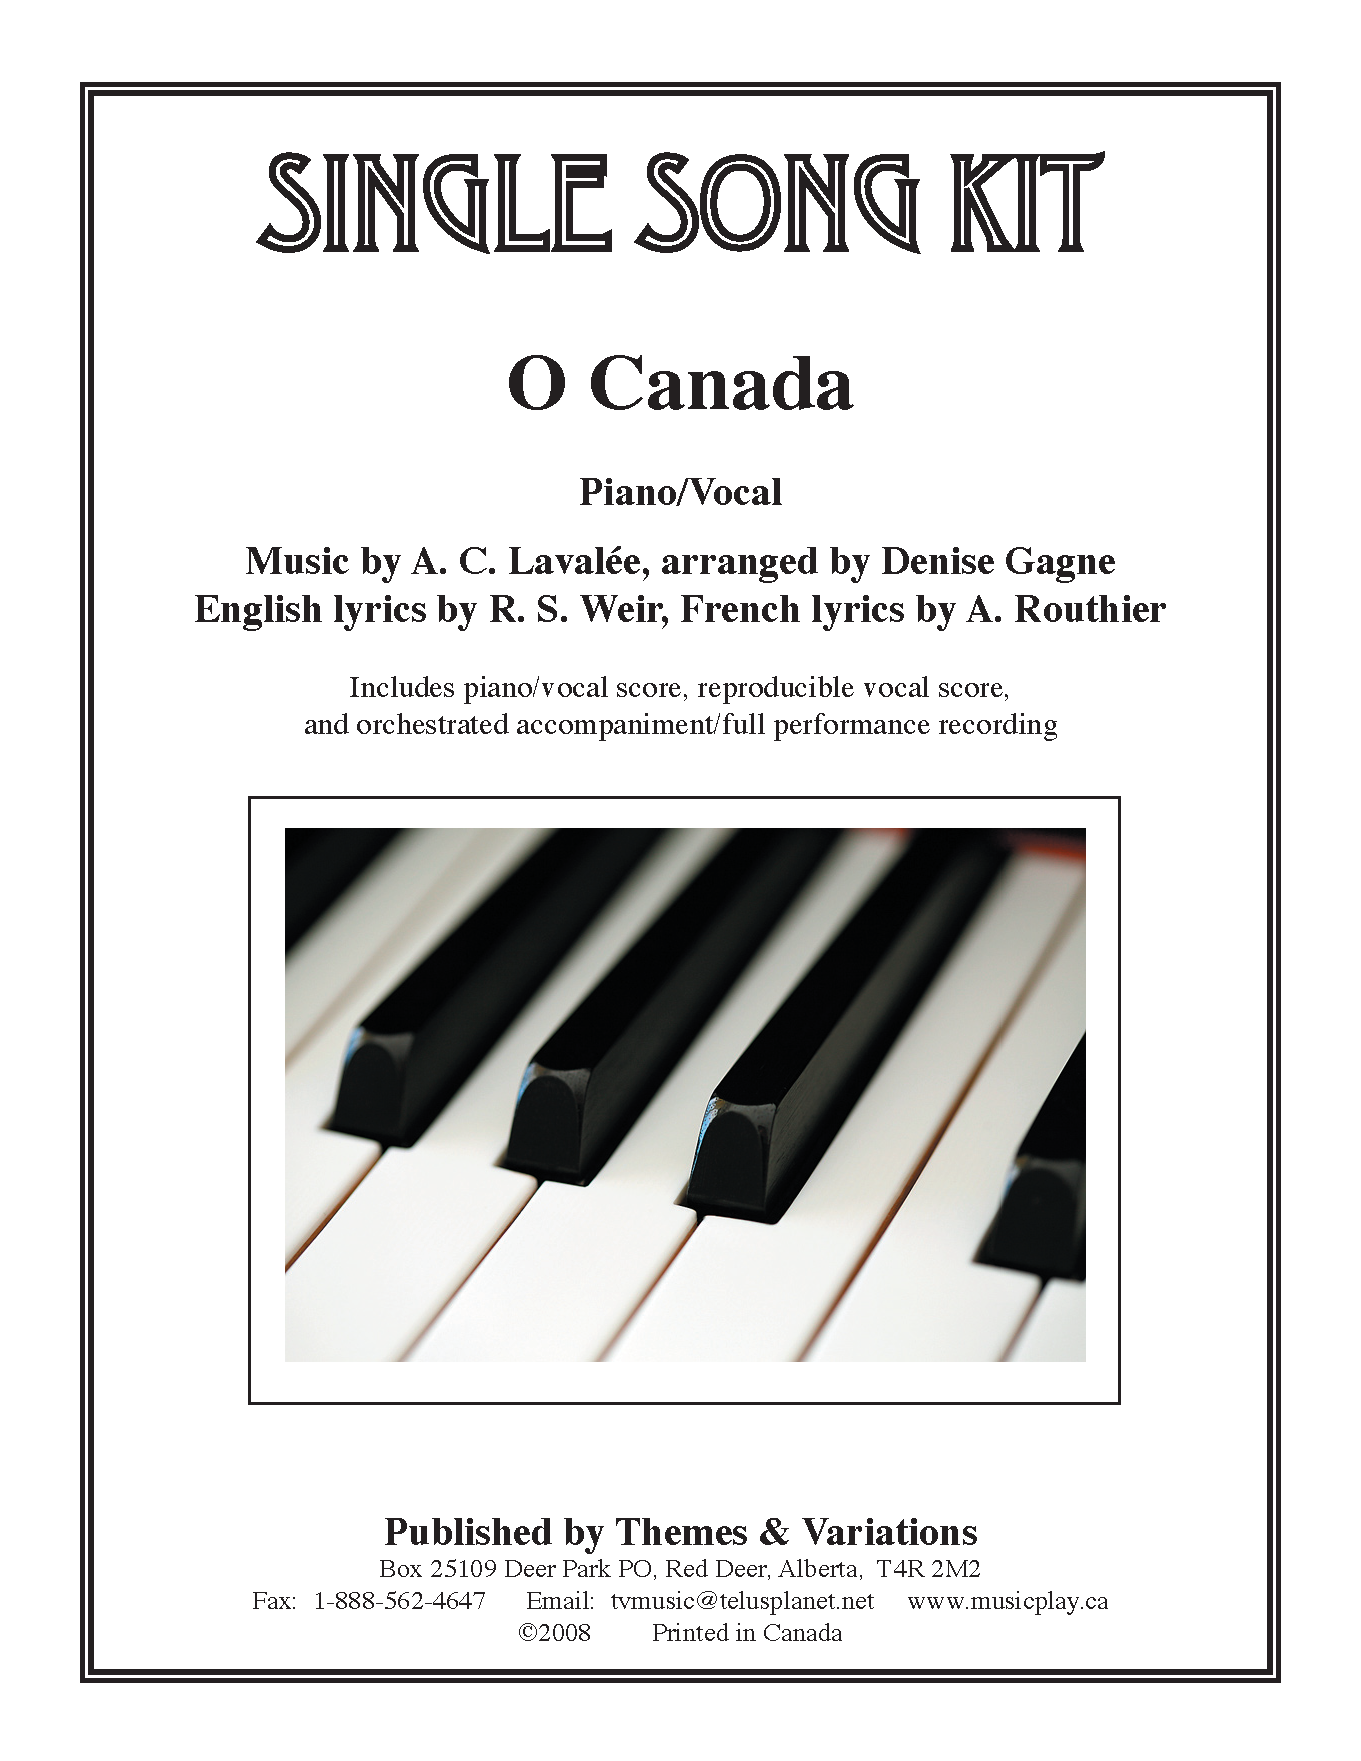 O Canada Single Song Kit Download | Songs, Choir songs, Piano